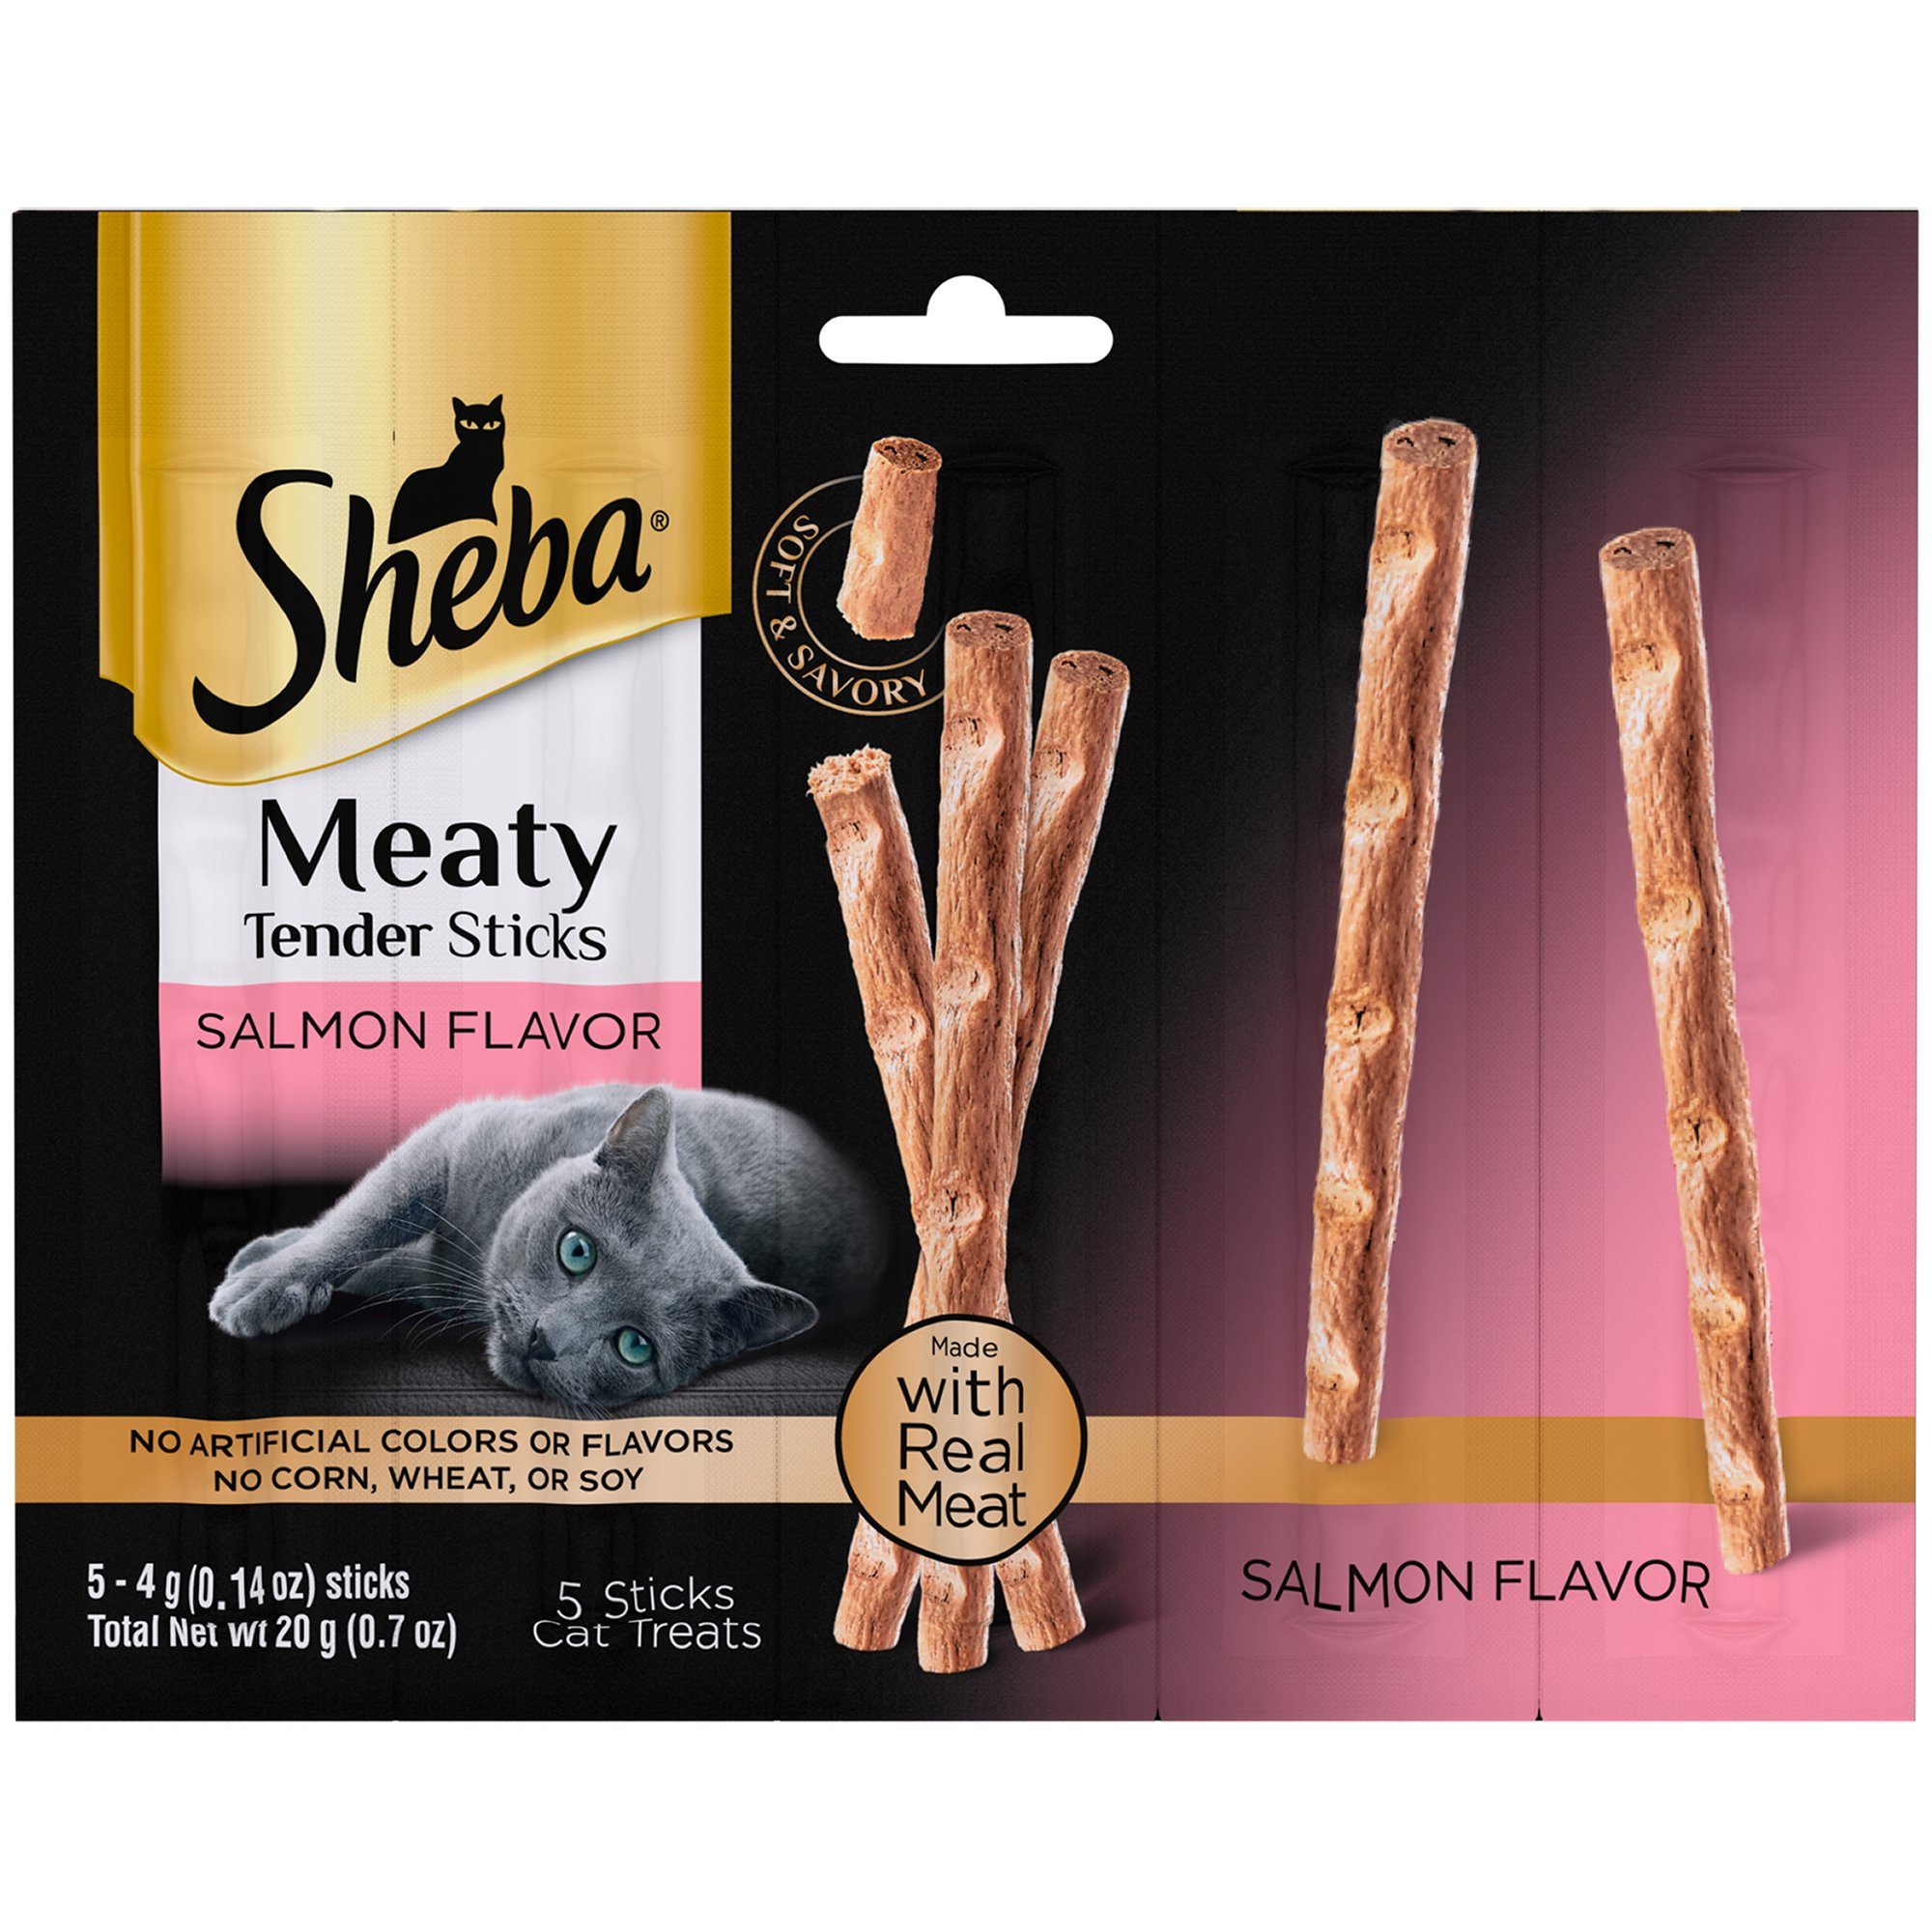 6 Bags of Sheba Meaty Tender Sticks Salmon Flavor Cat Treats - 0.7 Oz (5 Treats in ea Bag)